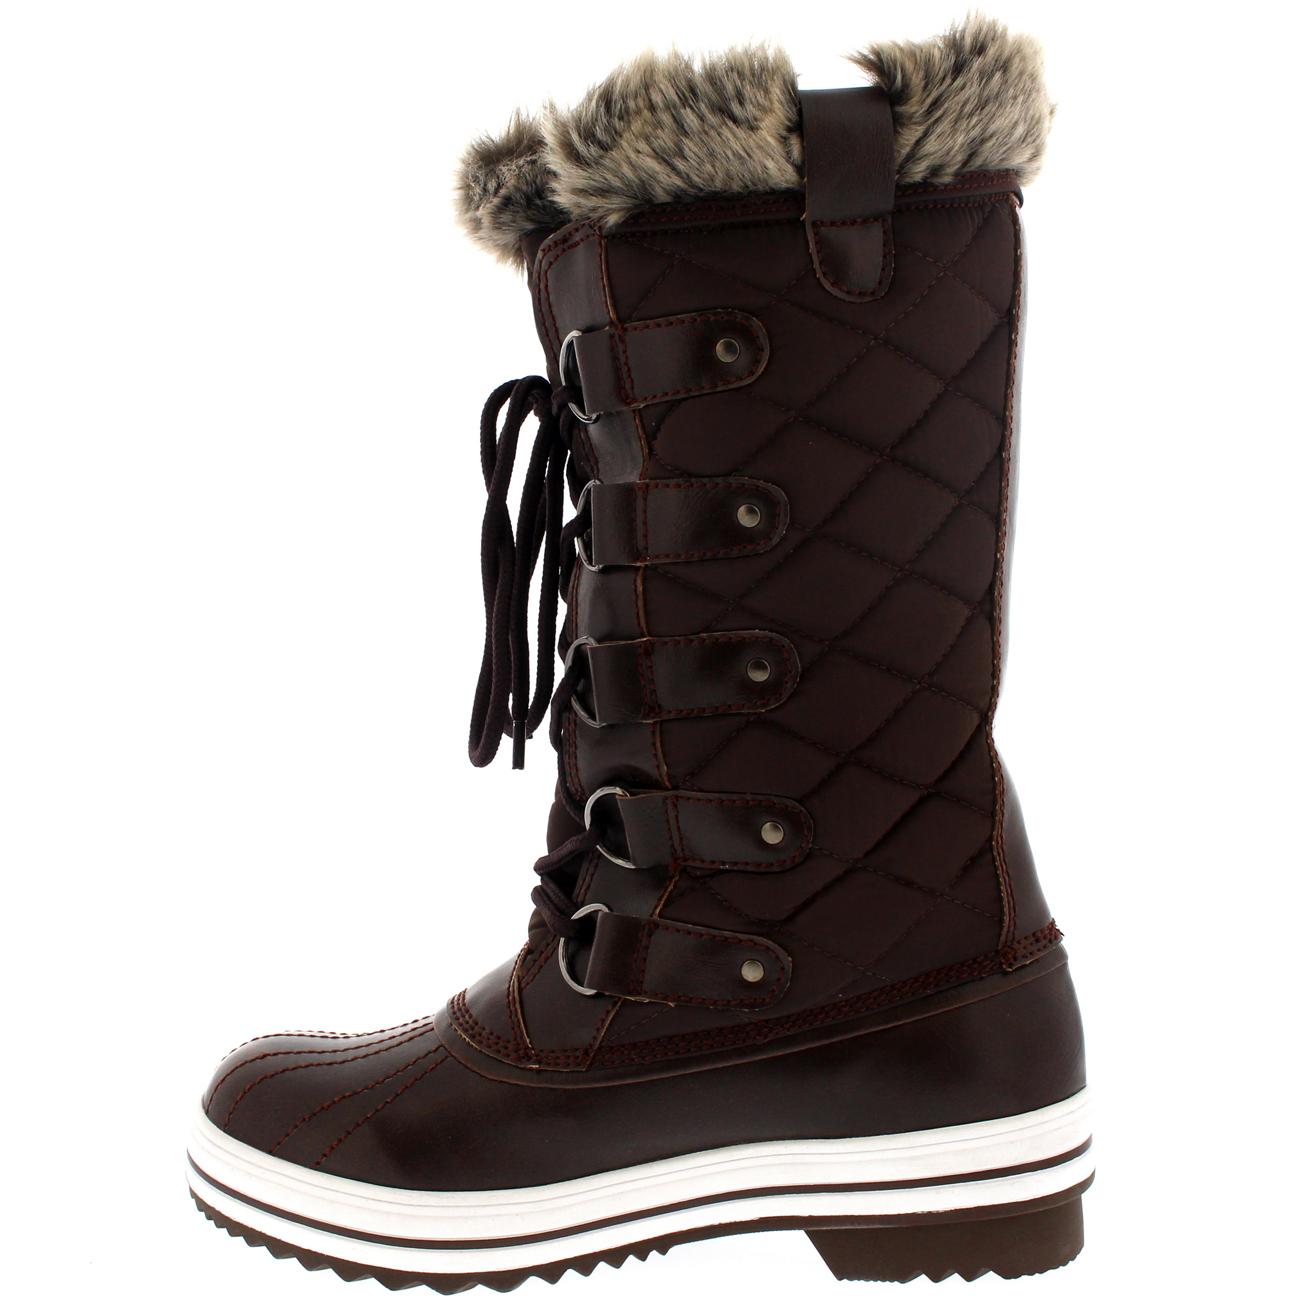 Ladies Snow Boot Nylon Tall Winter Waterproof Fur Lined